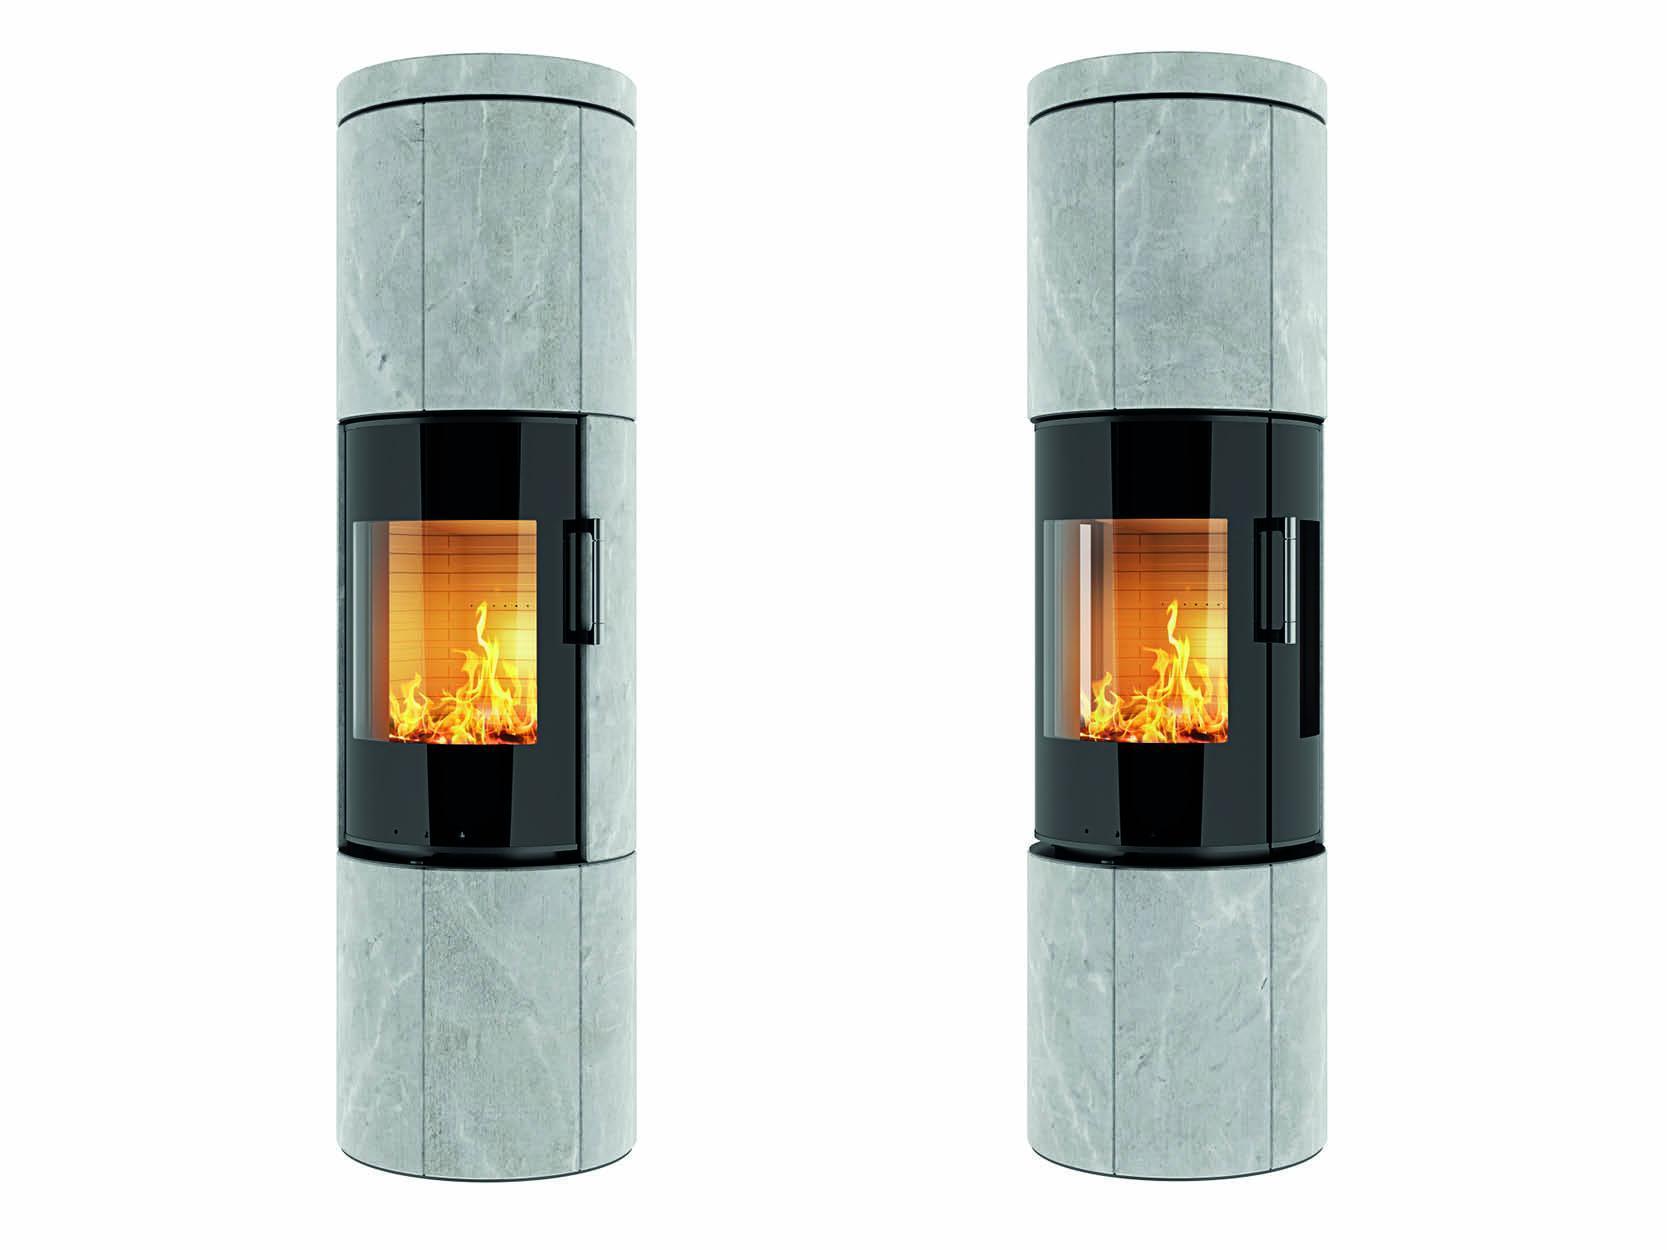 Ceramic Wood Burning Stove By Rais Great Heating Economics